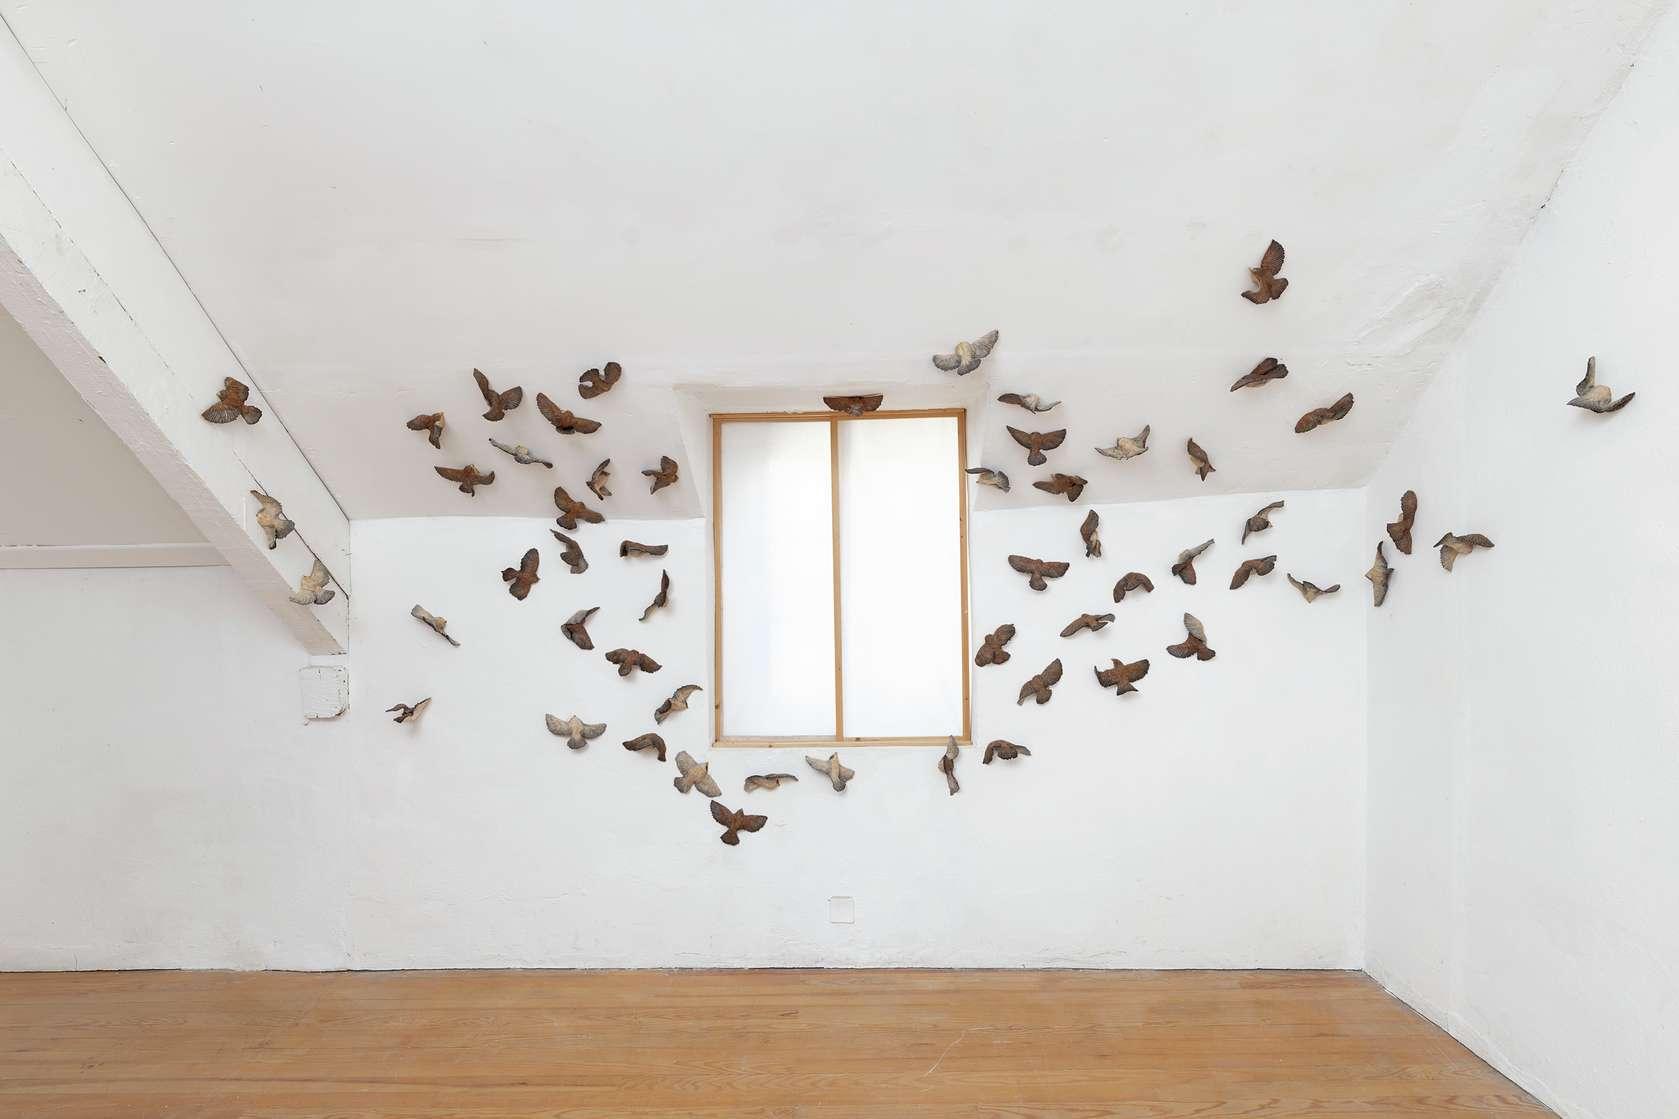 Sébastien Gouju Figures de l'animal Abbaye Saint André Centre d'Art Contemporain, Meymac (FR) 17 mars  — 17 juin 2019